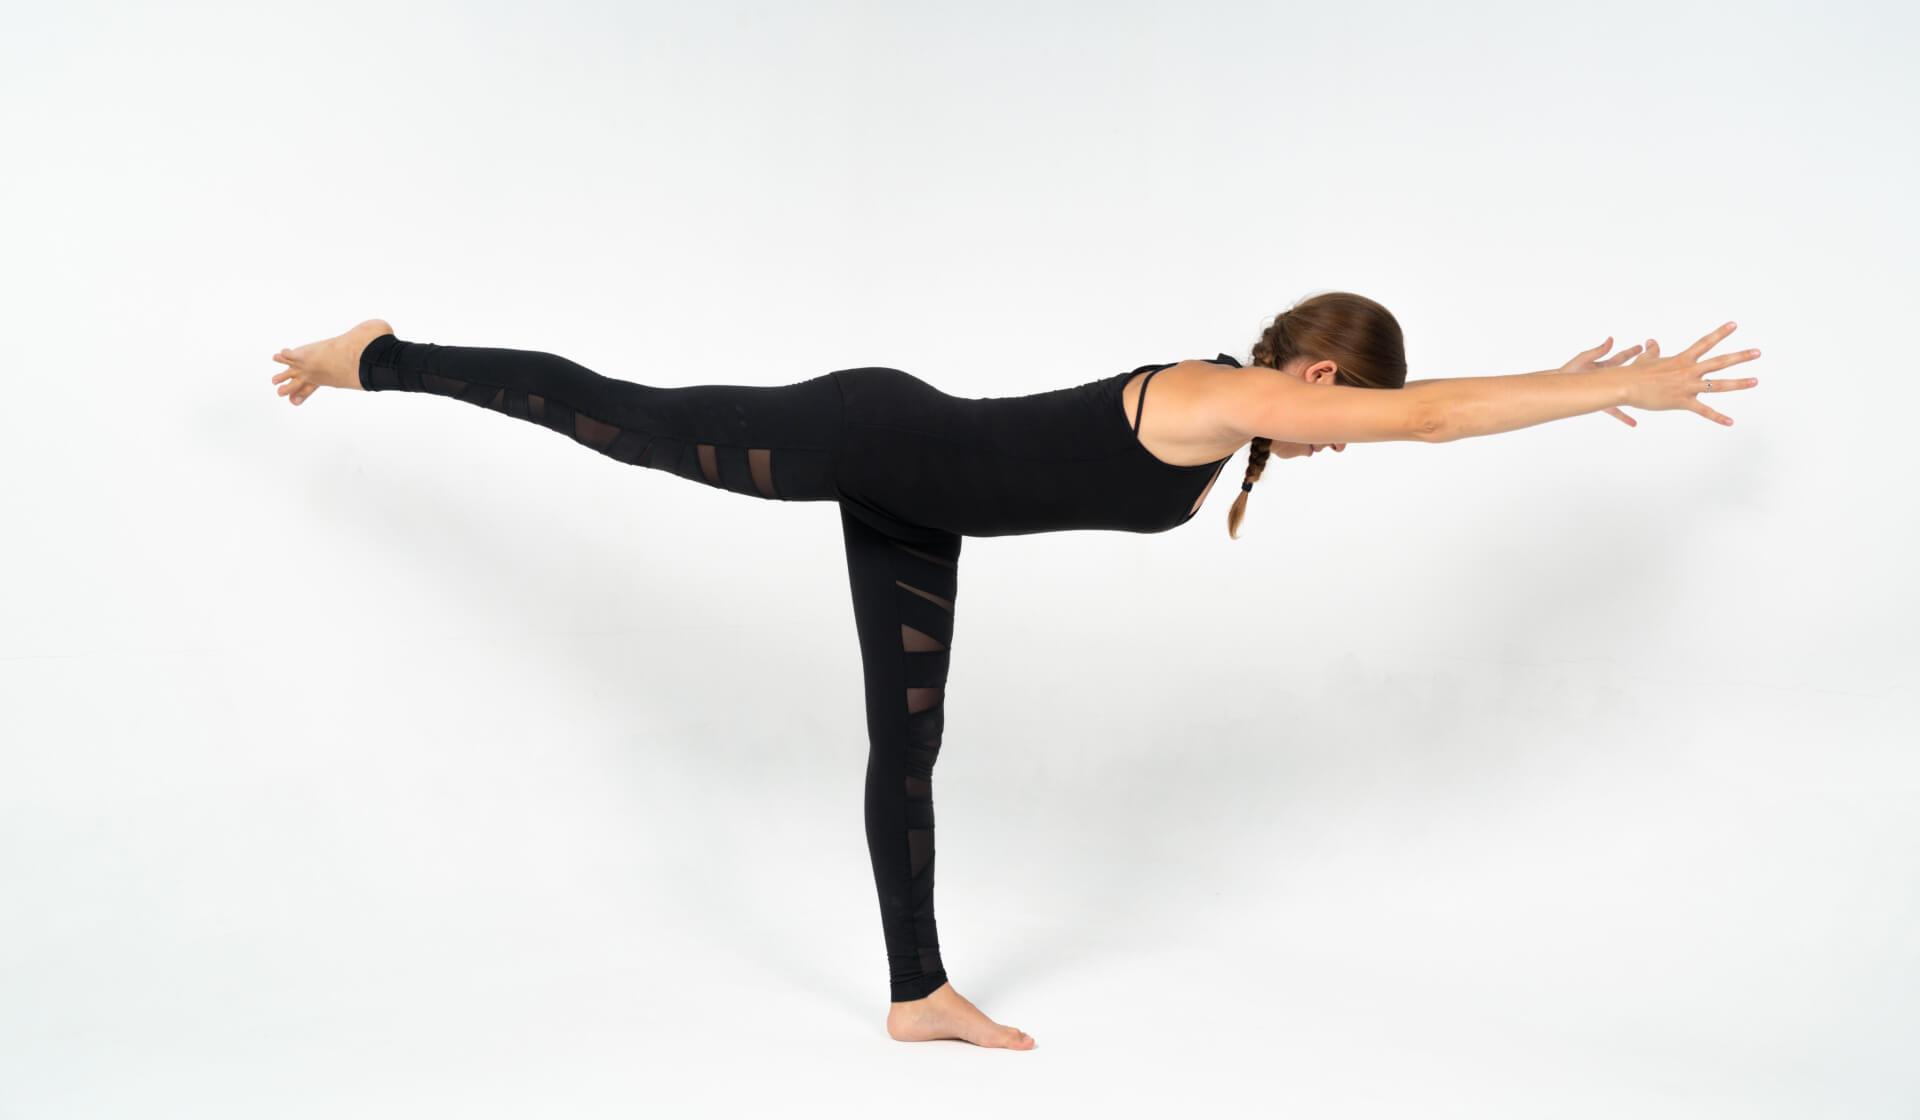 Woman yoga teacher dressed in all black practicing a balancing yoga pose (warrior III or virabhadrasana III) against a white backdrop